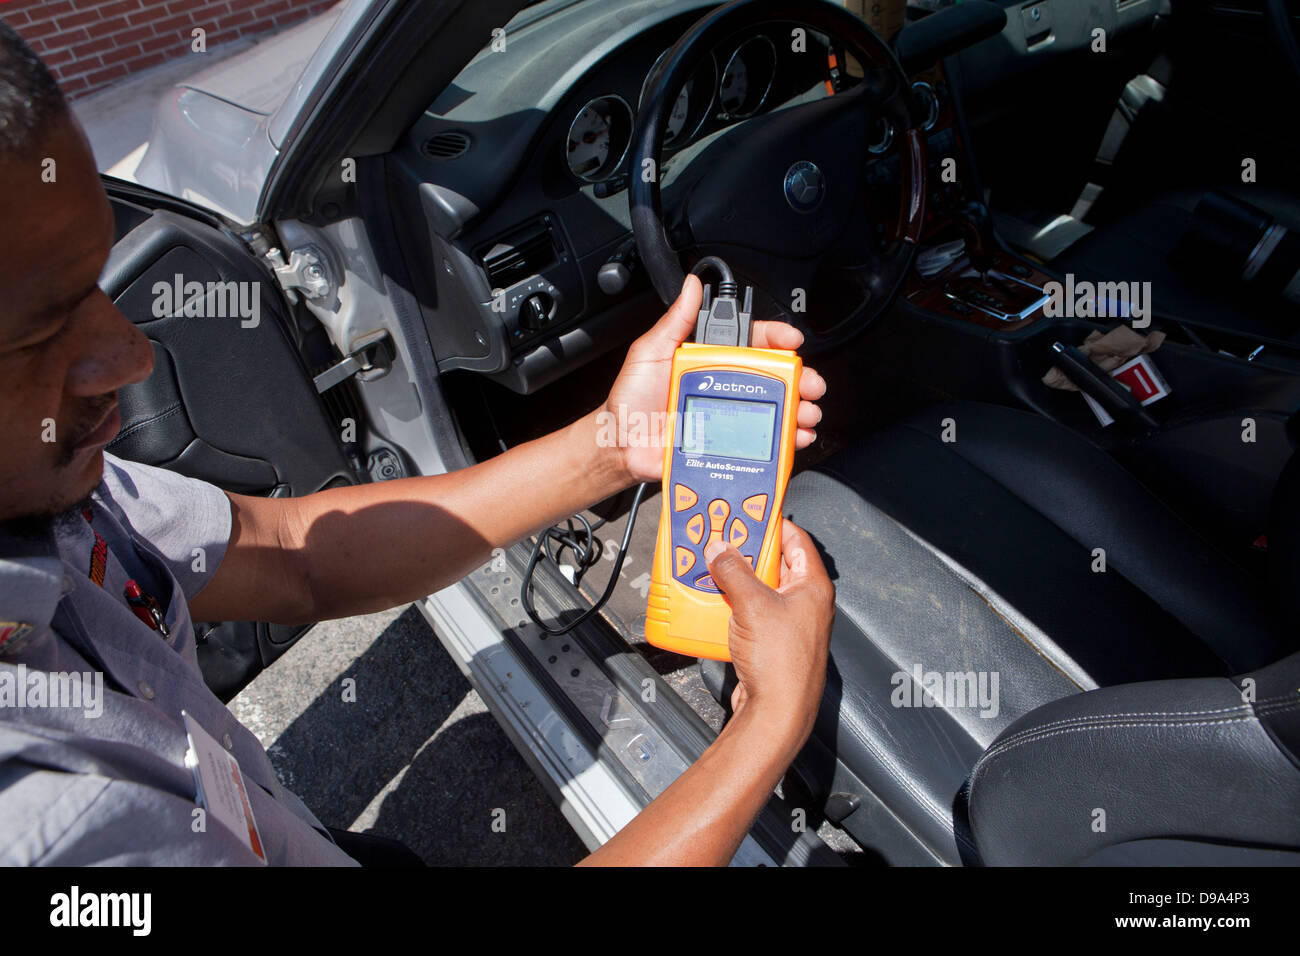 Auto mechanic using car diagnostic scanner (OBD II scanner